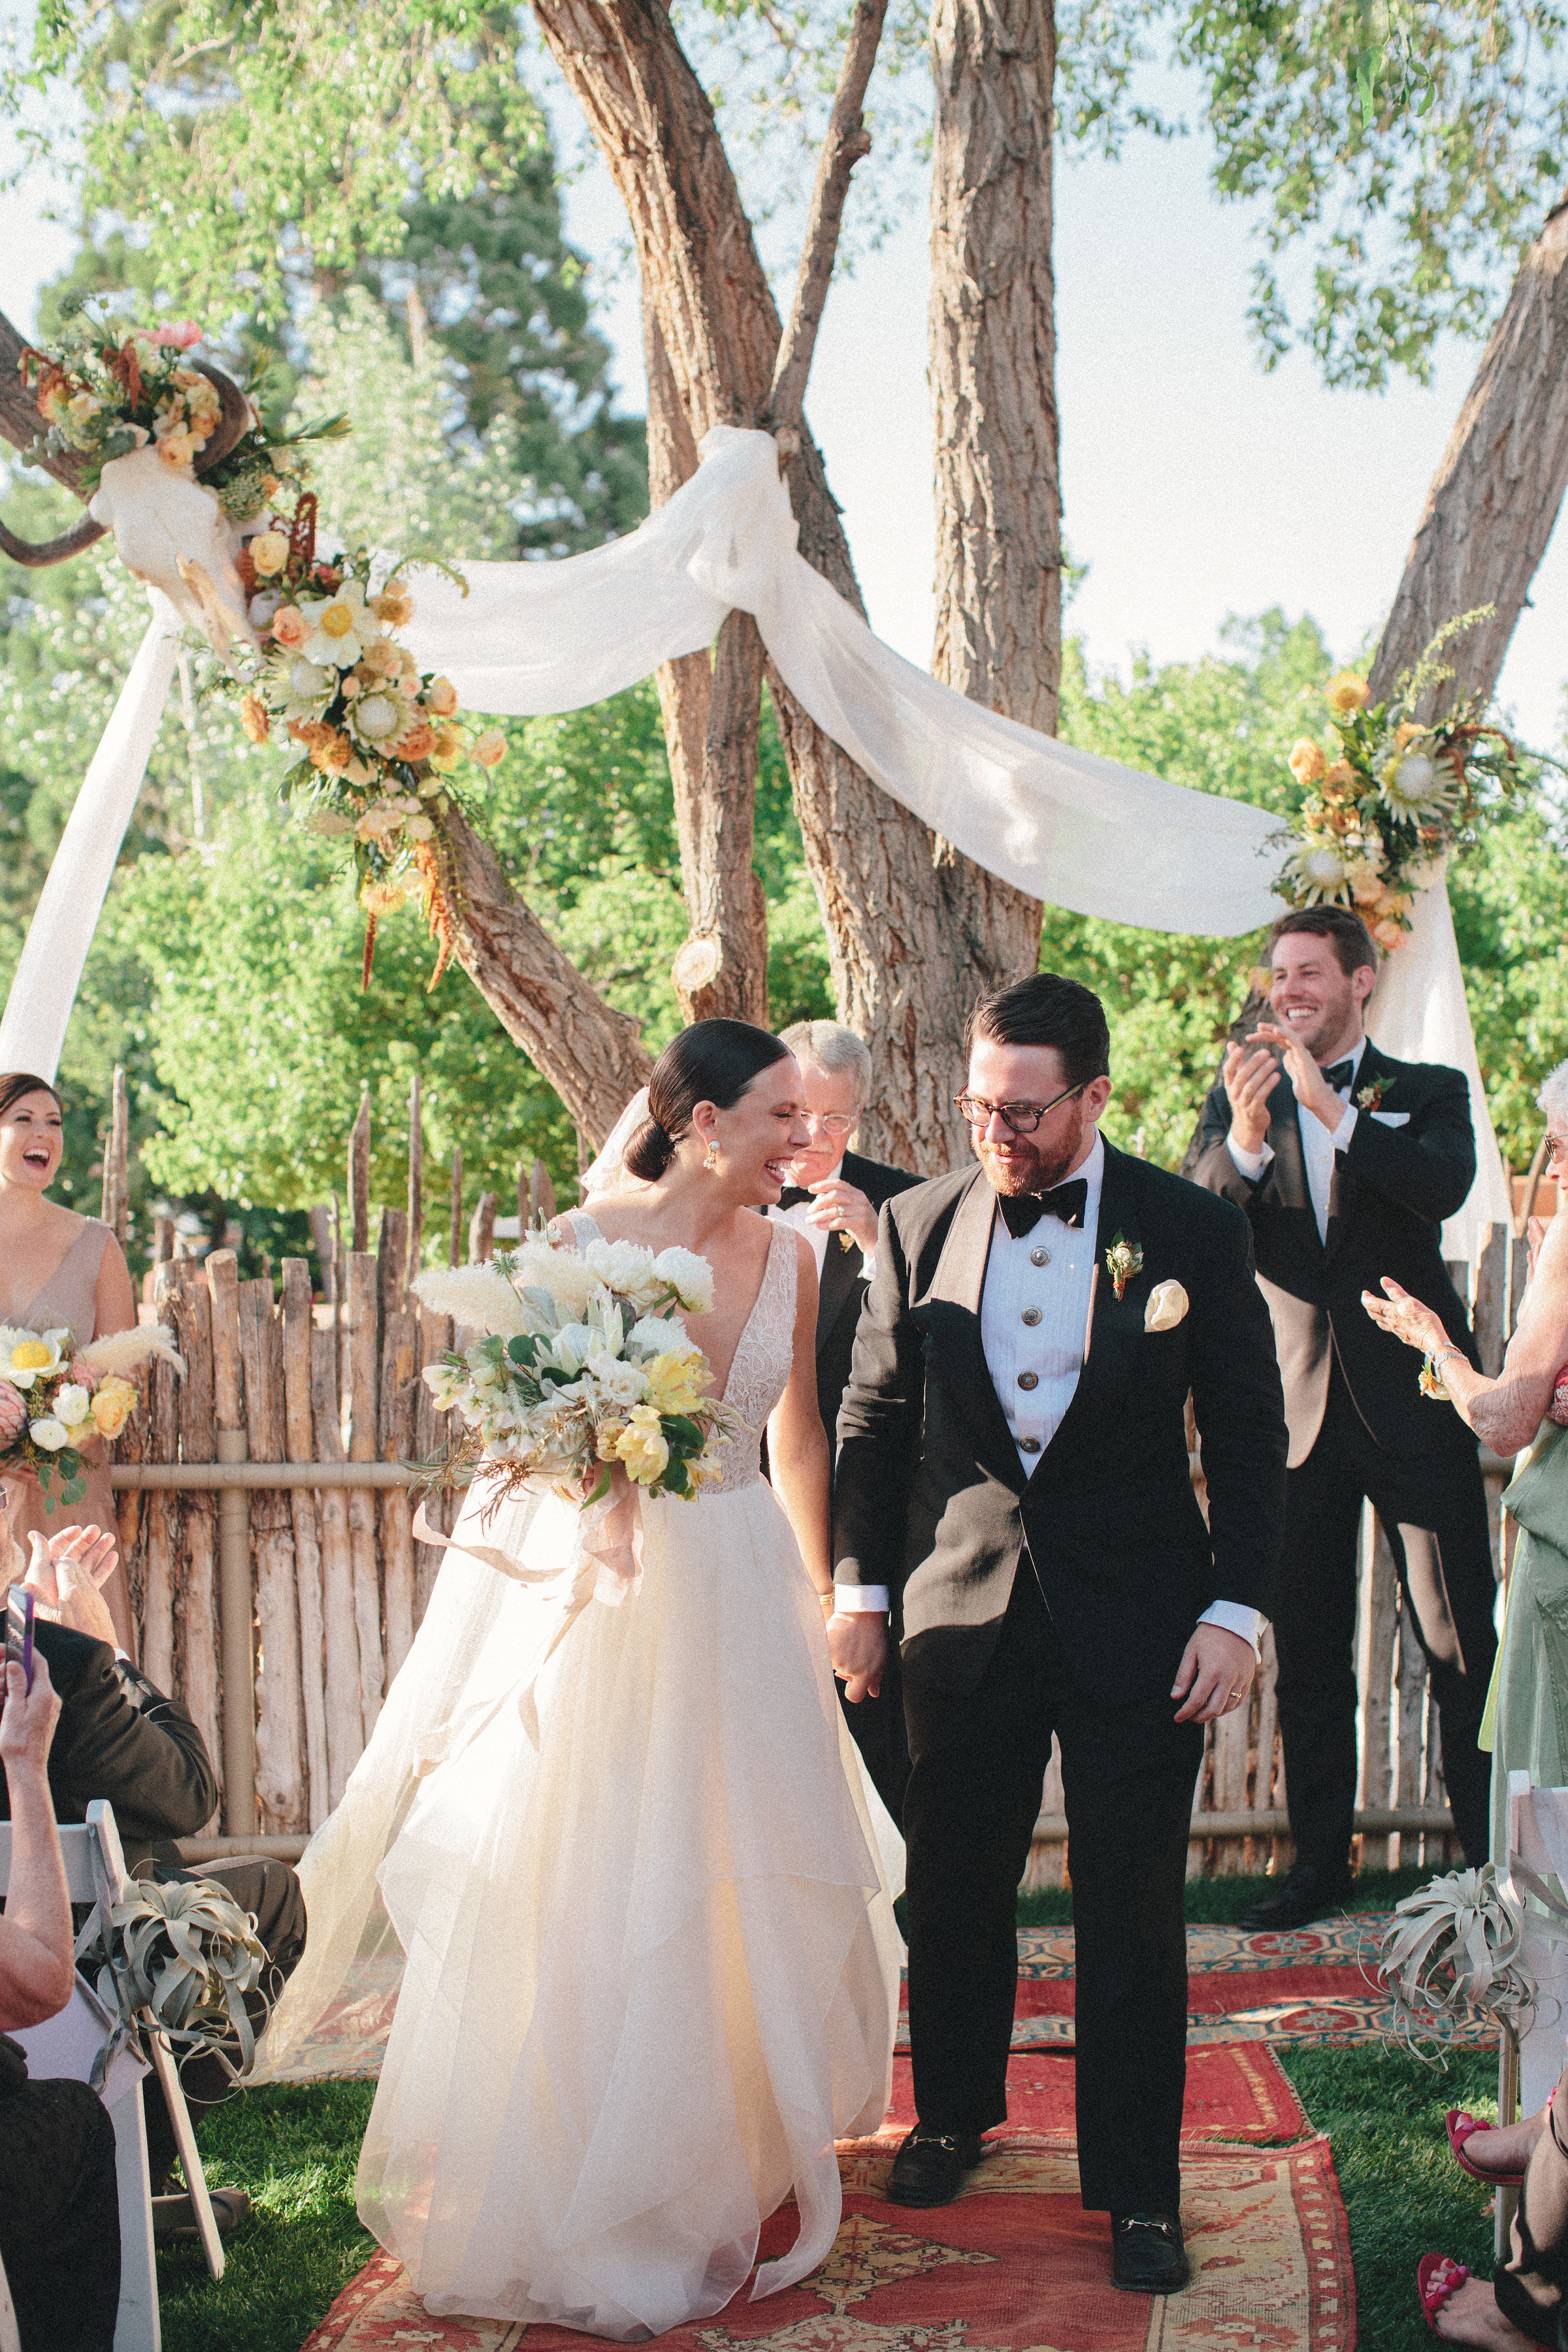 landry_lovelace_wedding_jbobephoto-526.jpg